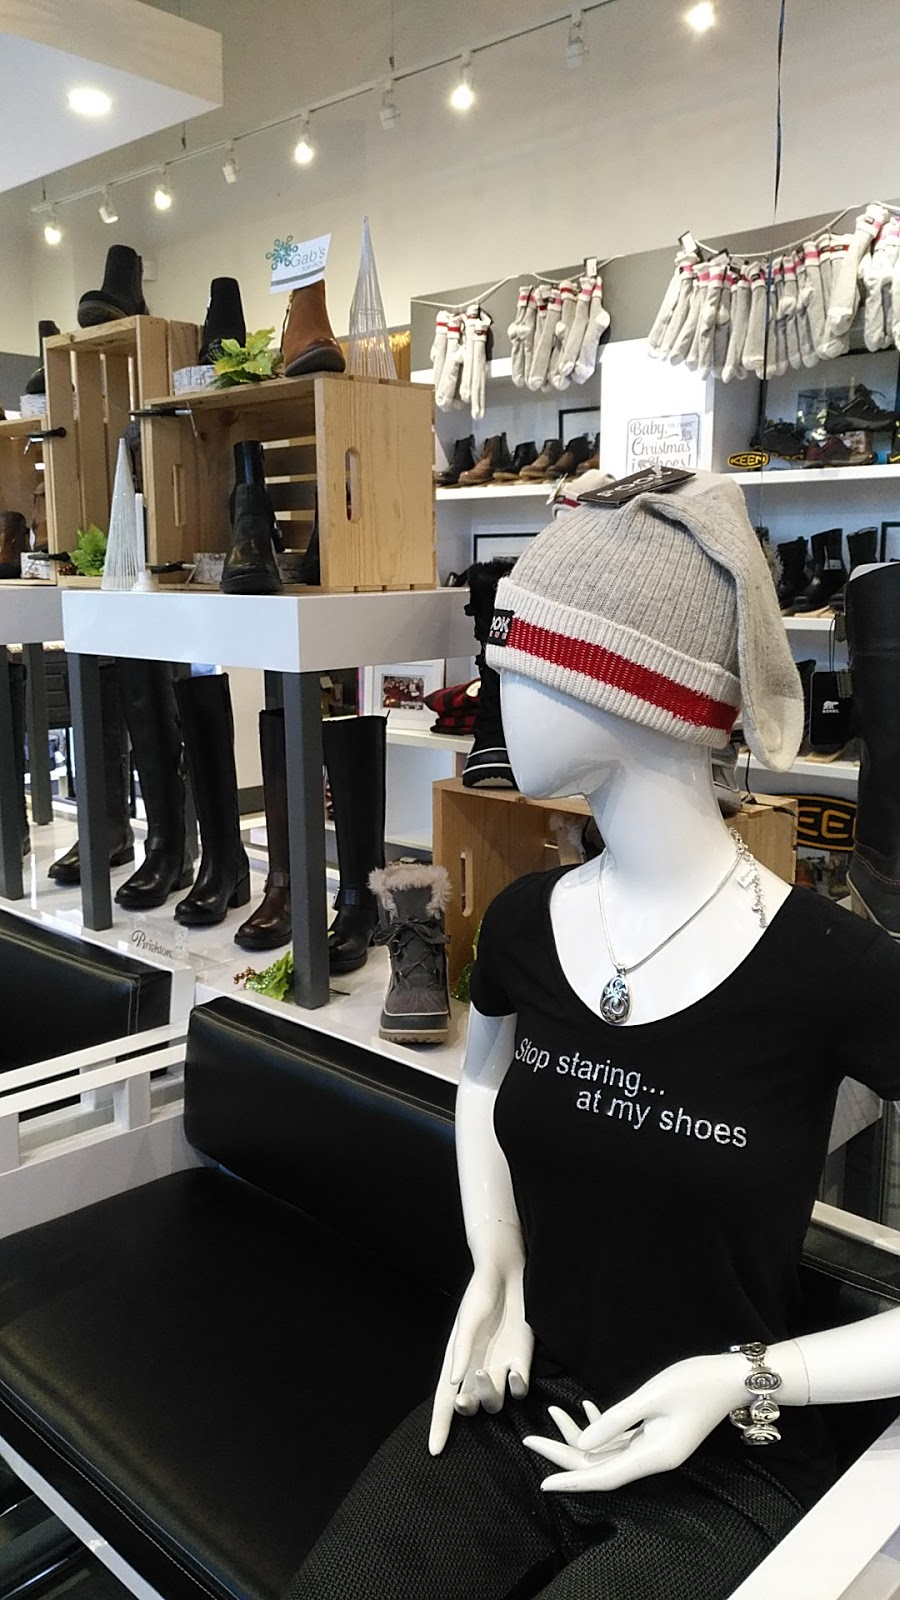 DeSimone Shoes & Spa Inc | hair care | 1001 Lasalle Blvd, Sudbury, ON P3A 1Y1, Canada | 7054707463 OR +1 705-470-7463